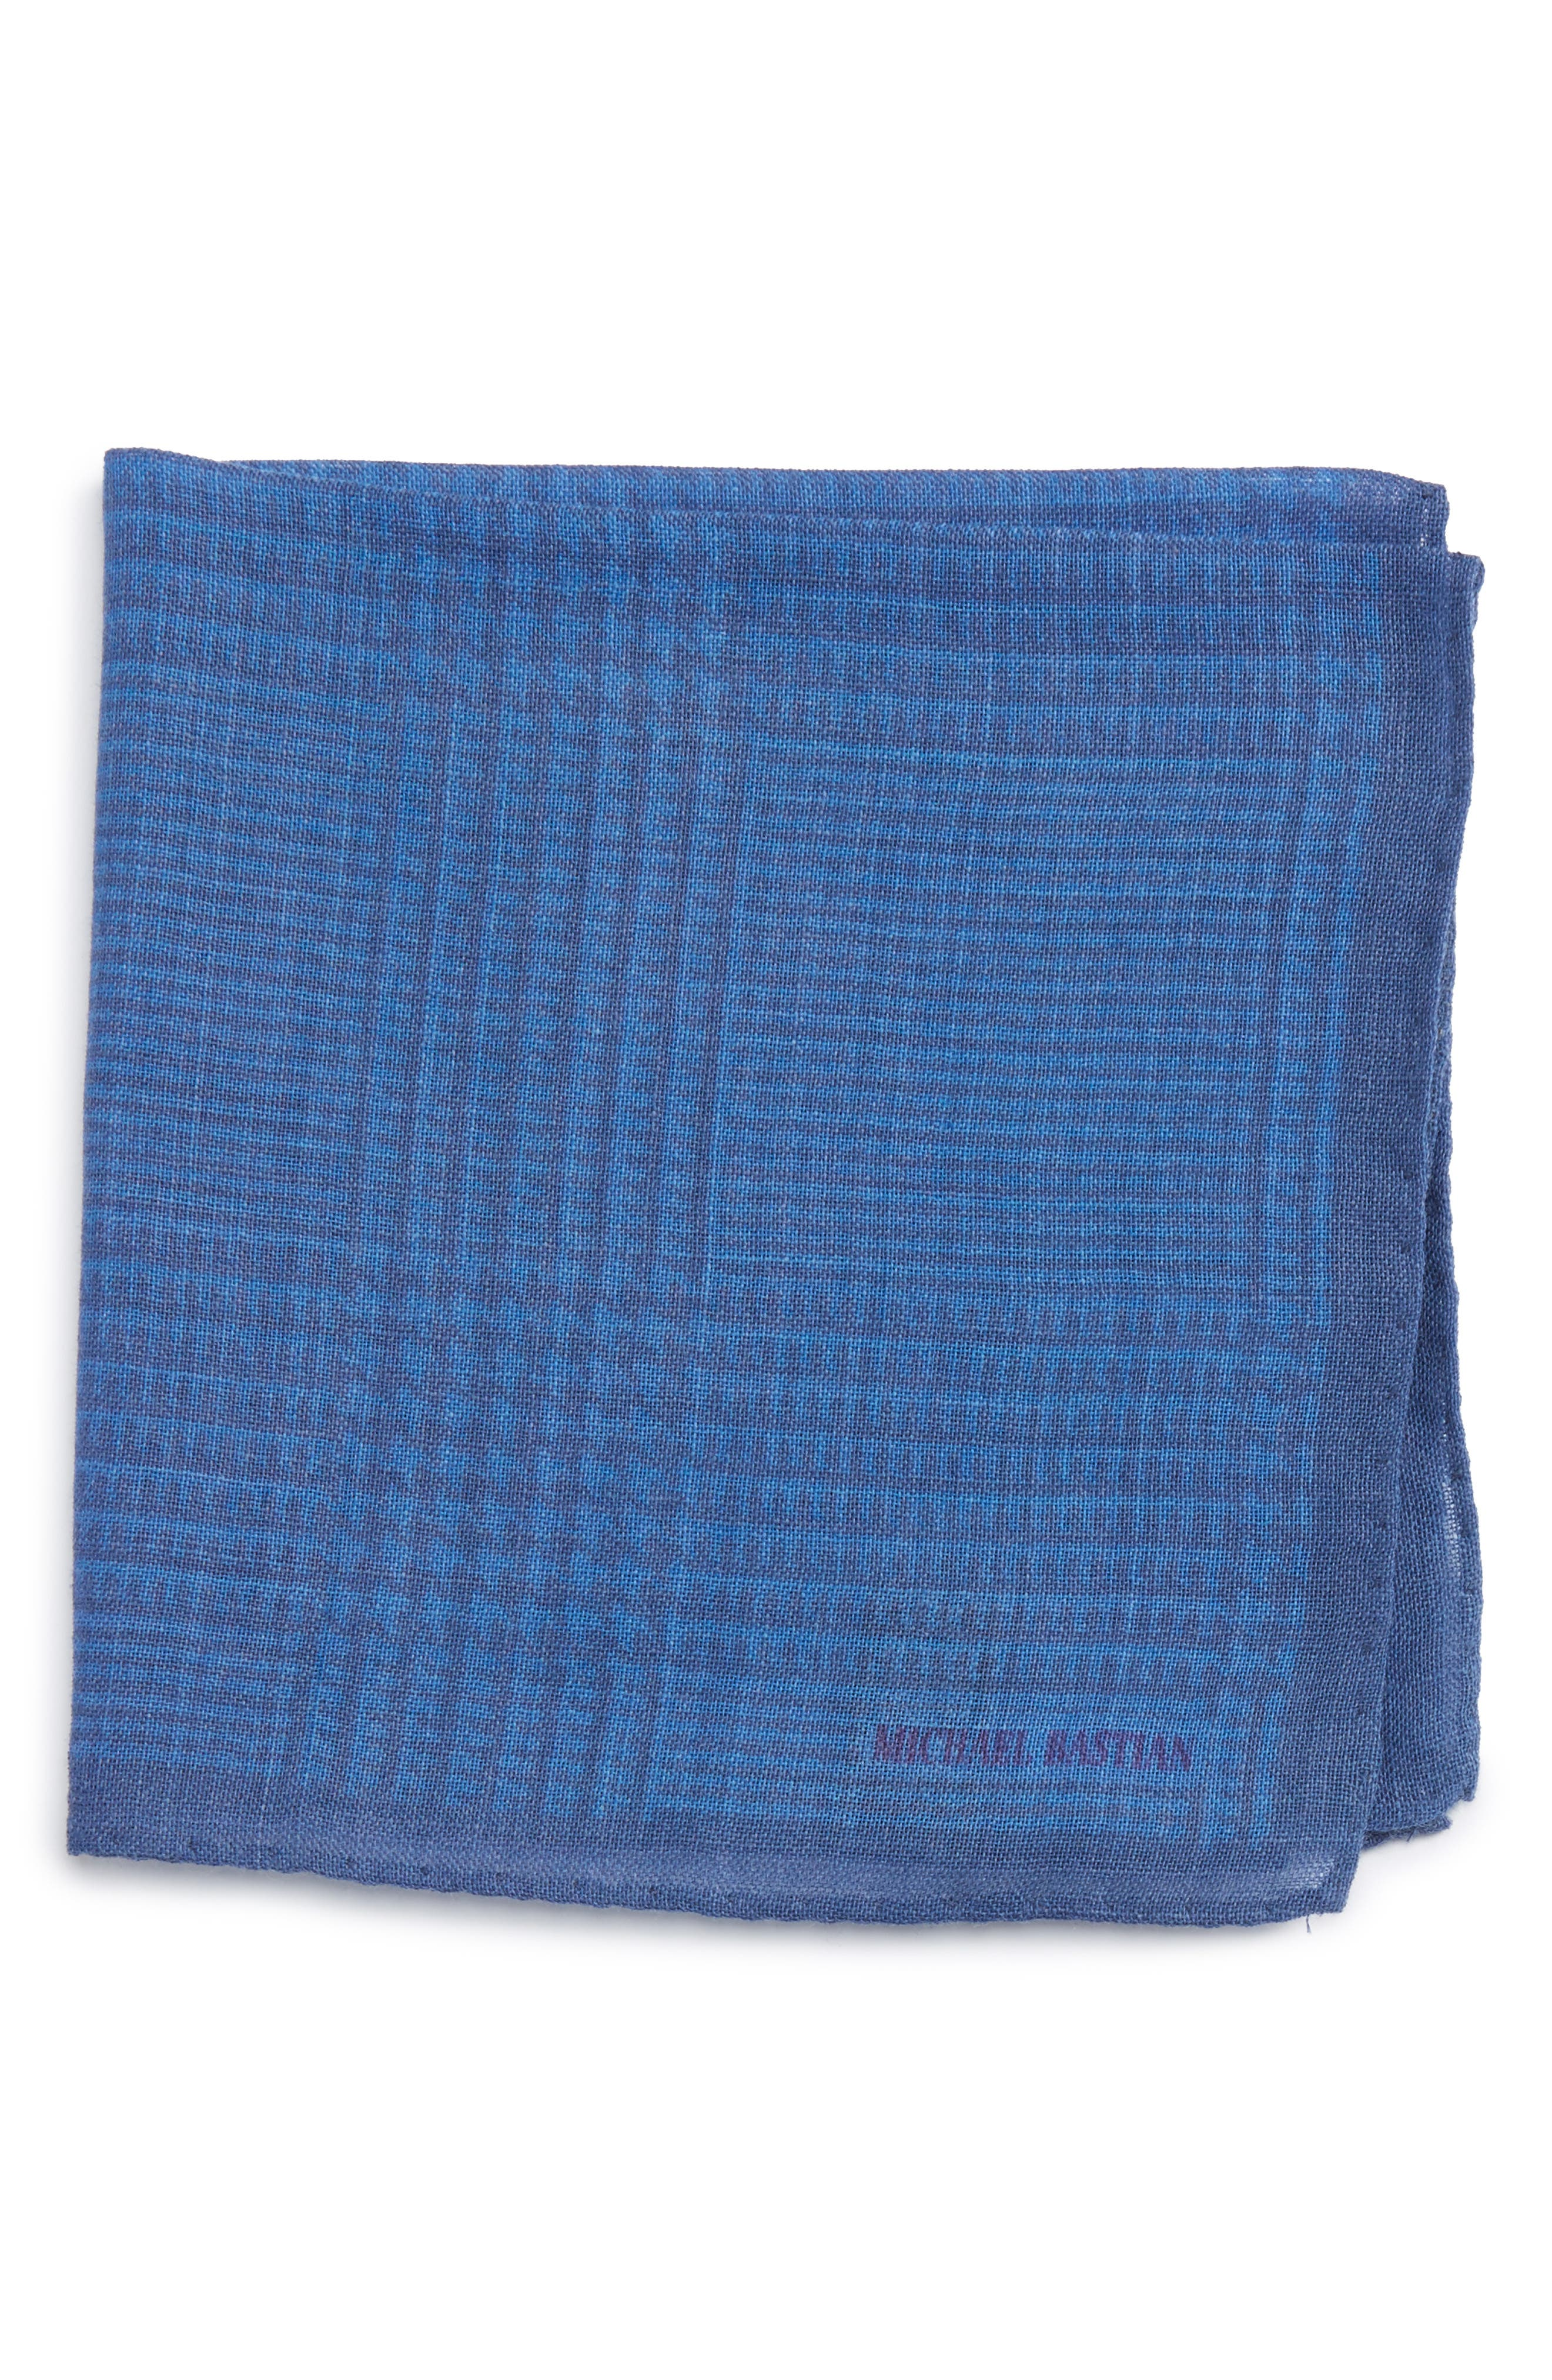 Grid Pocket Square,                         Main,                         color, 429